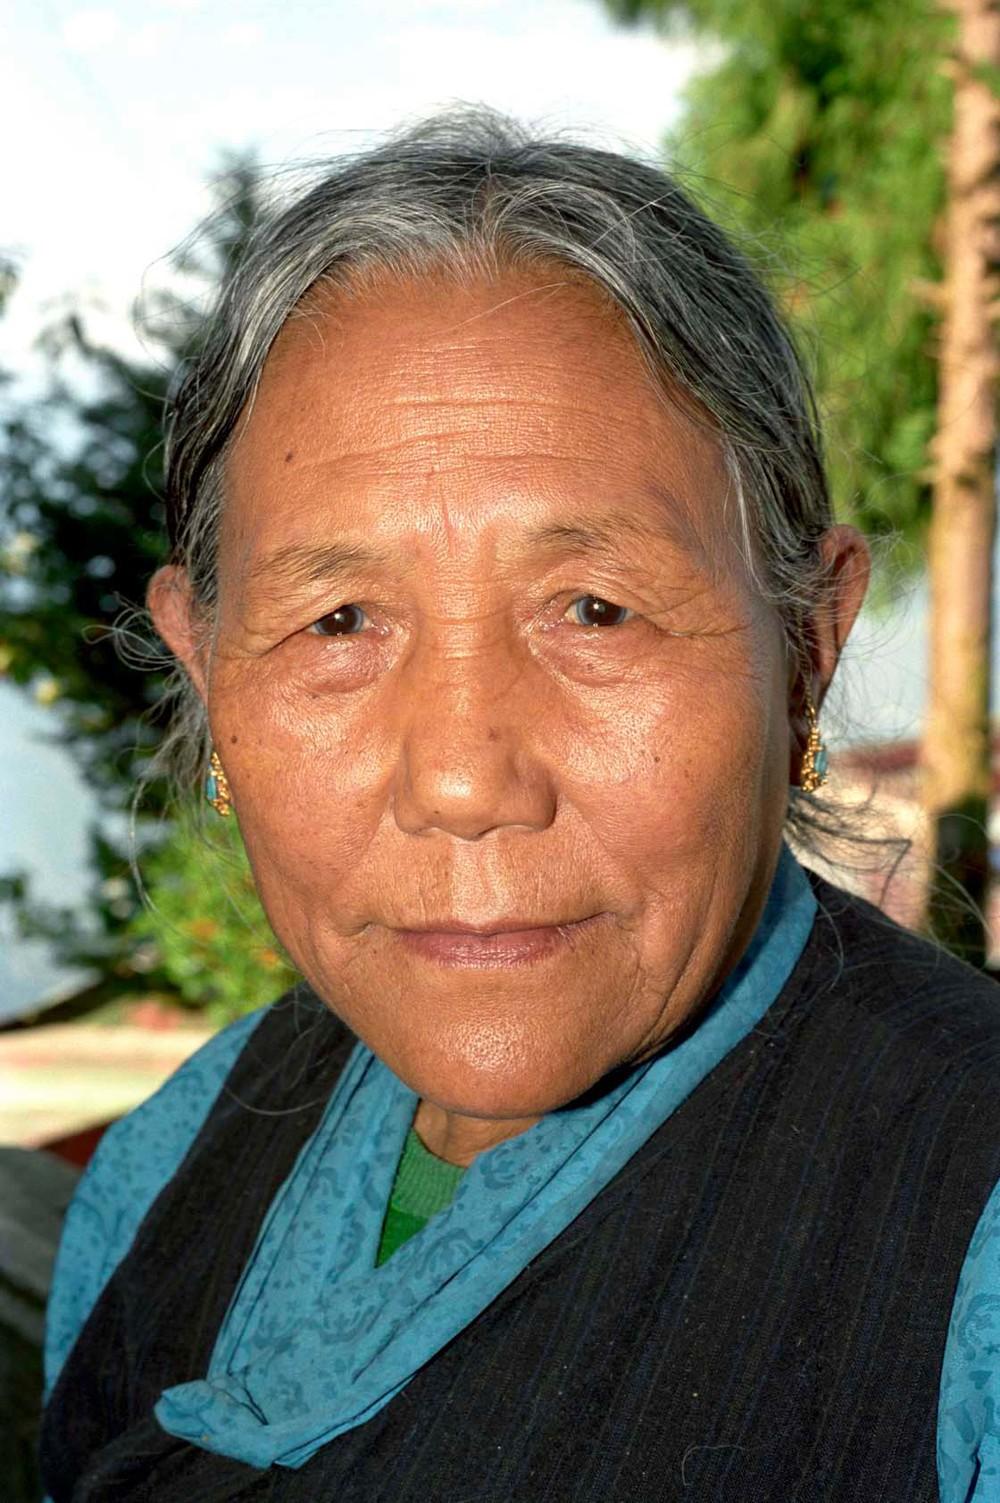 Tibetan refugee, India